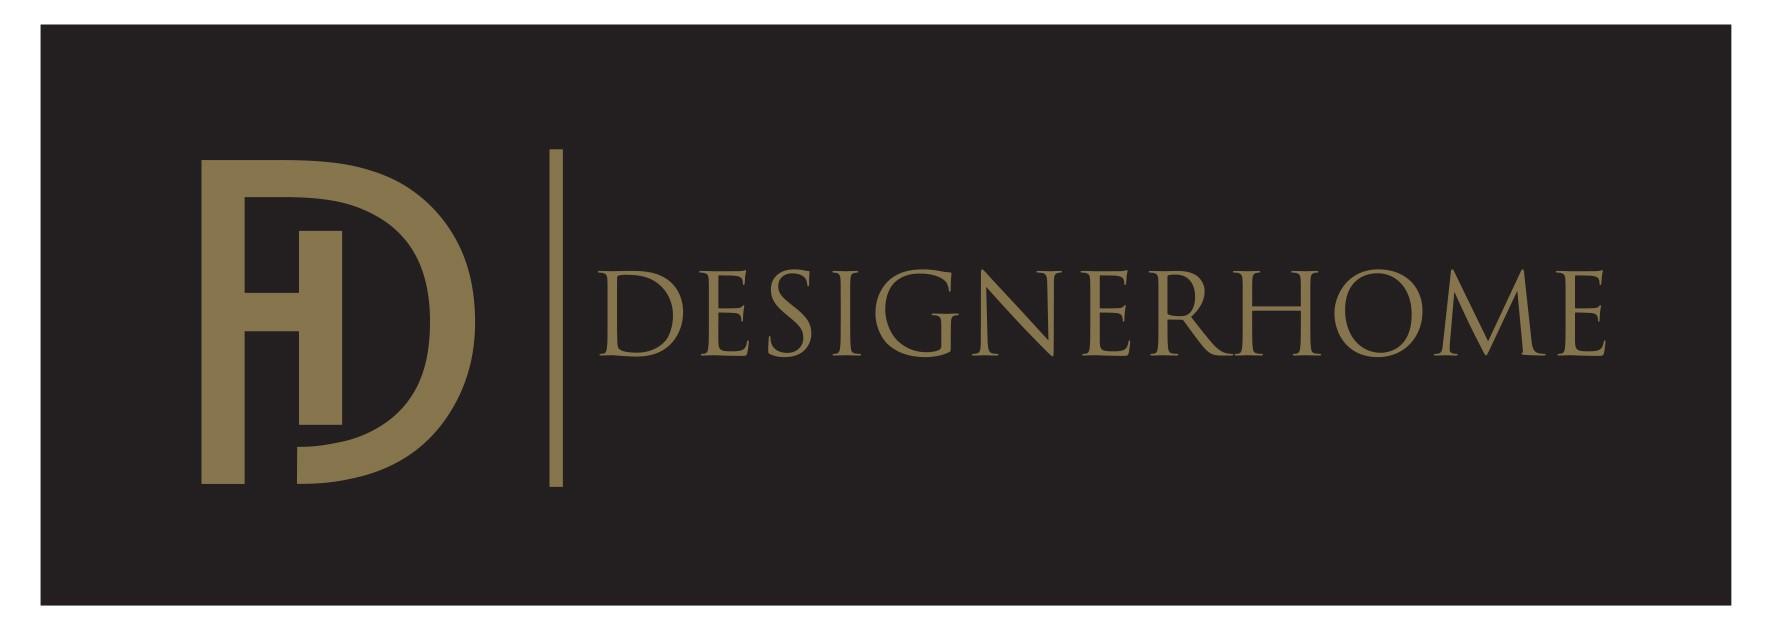 Designerhome